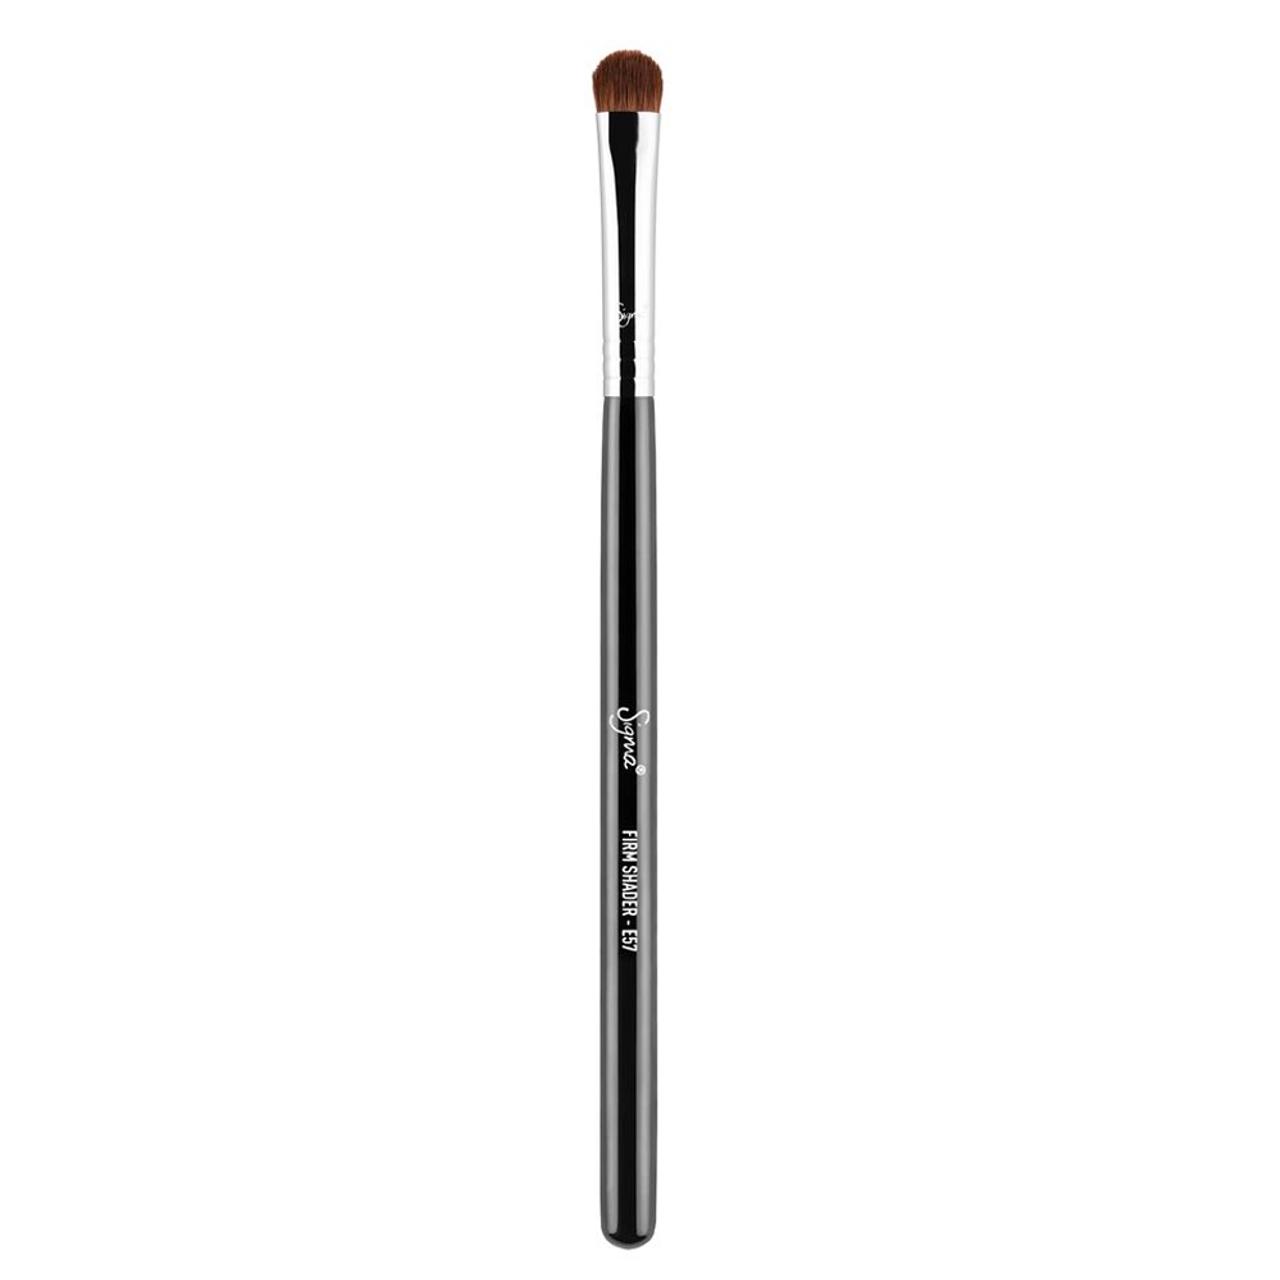 Sigma Beauty E57 - Firm Shader Brush